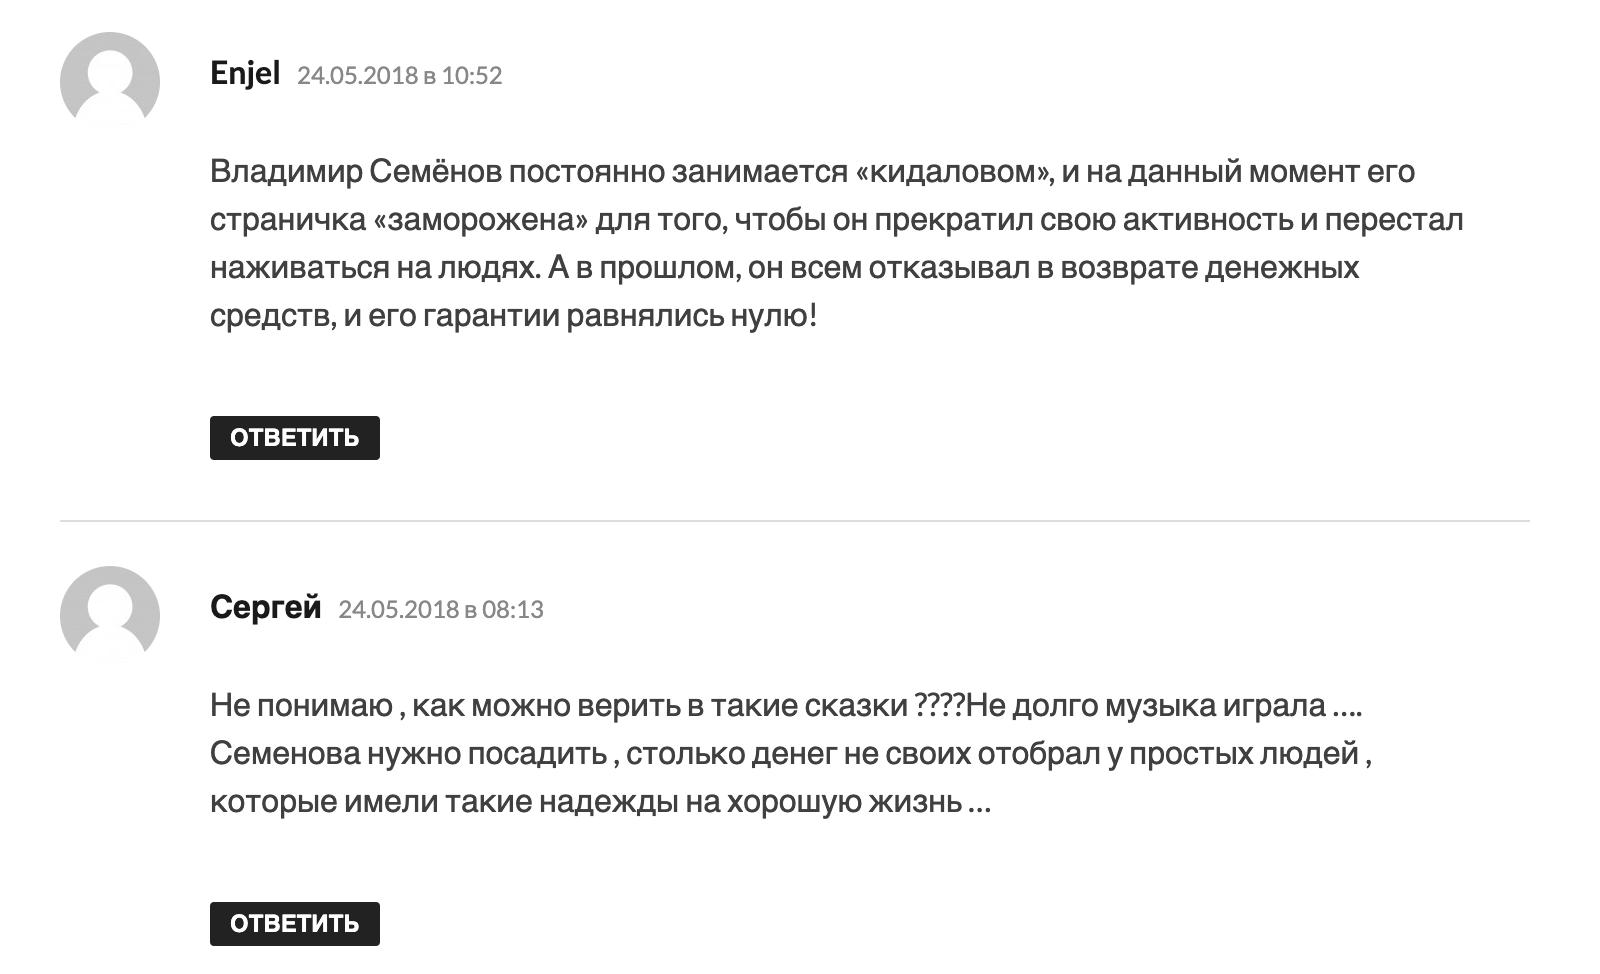 Отзывы о Владимире Семенове